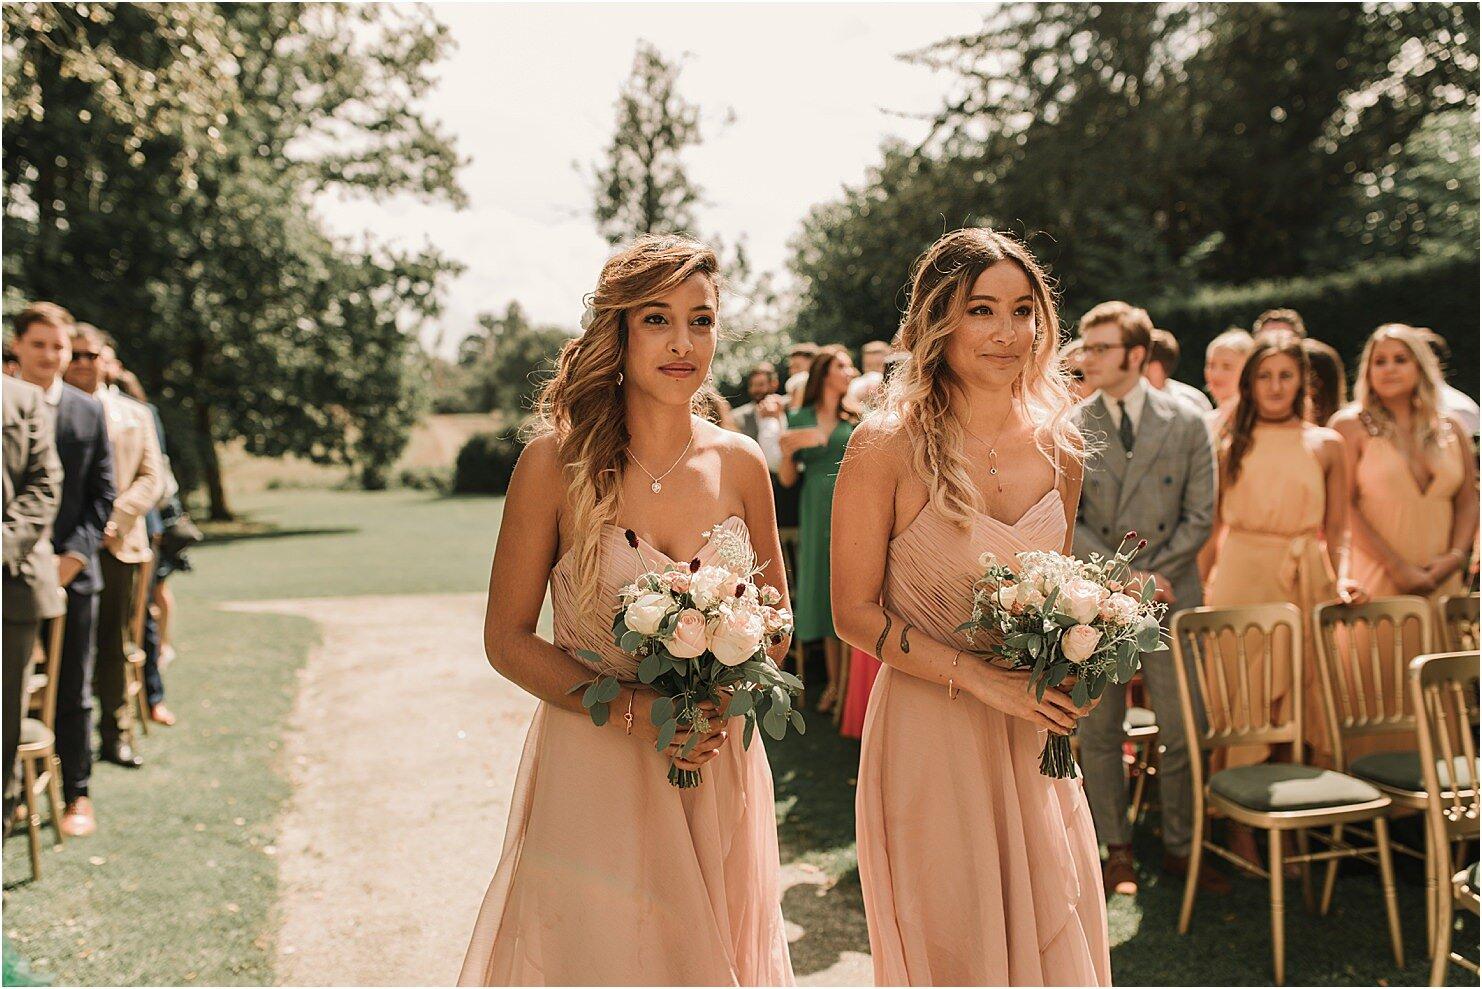 boda-de-cuento-en-castillo-boda-en-londres-47.jpg